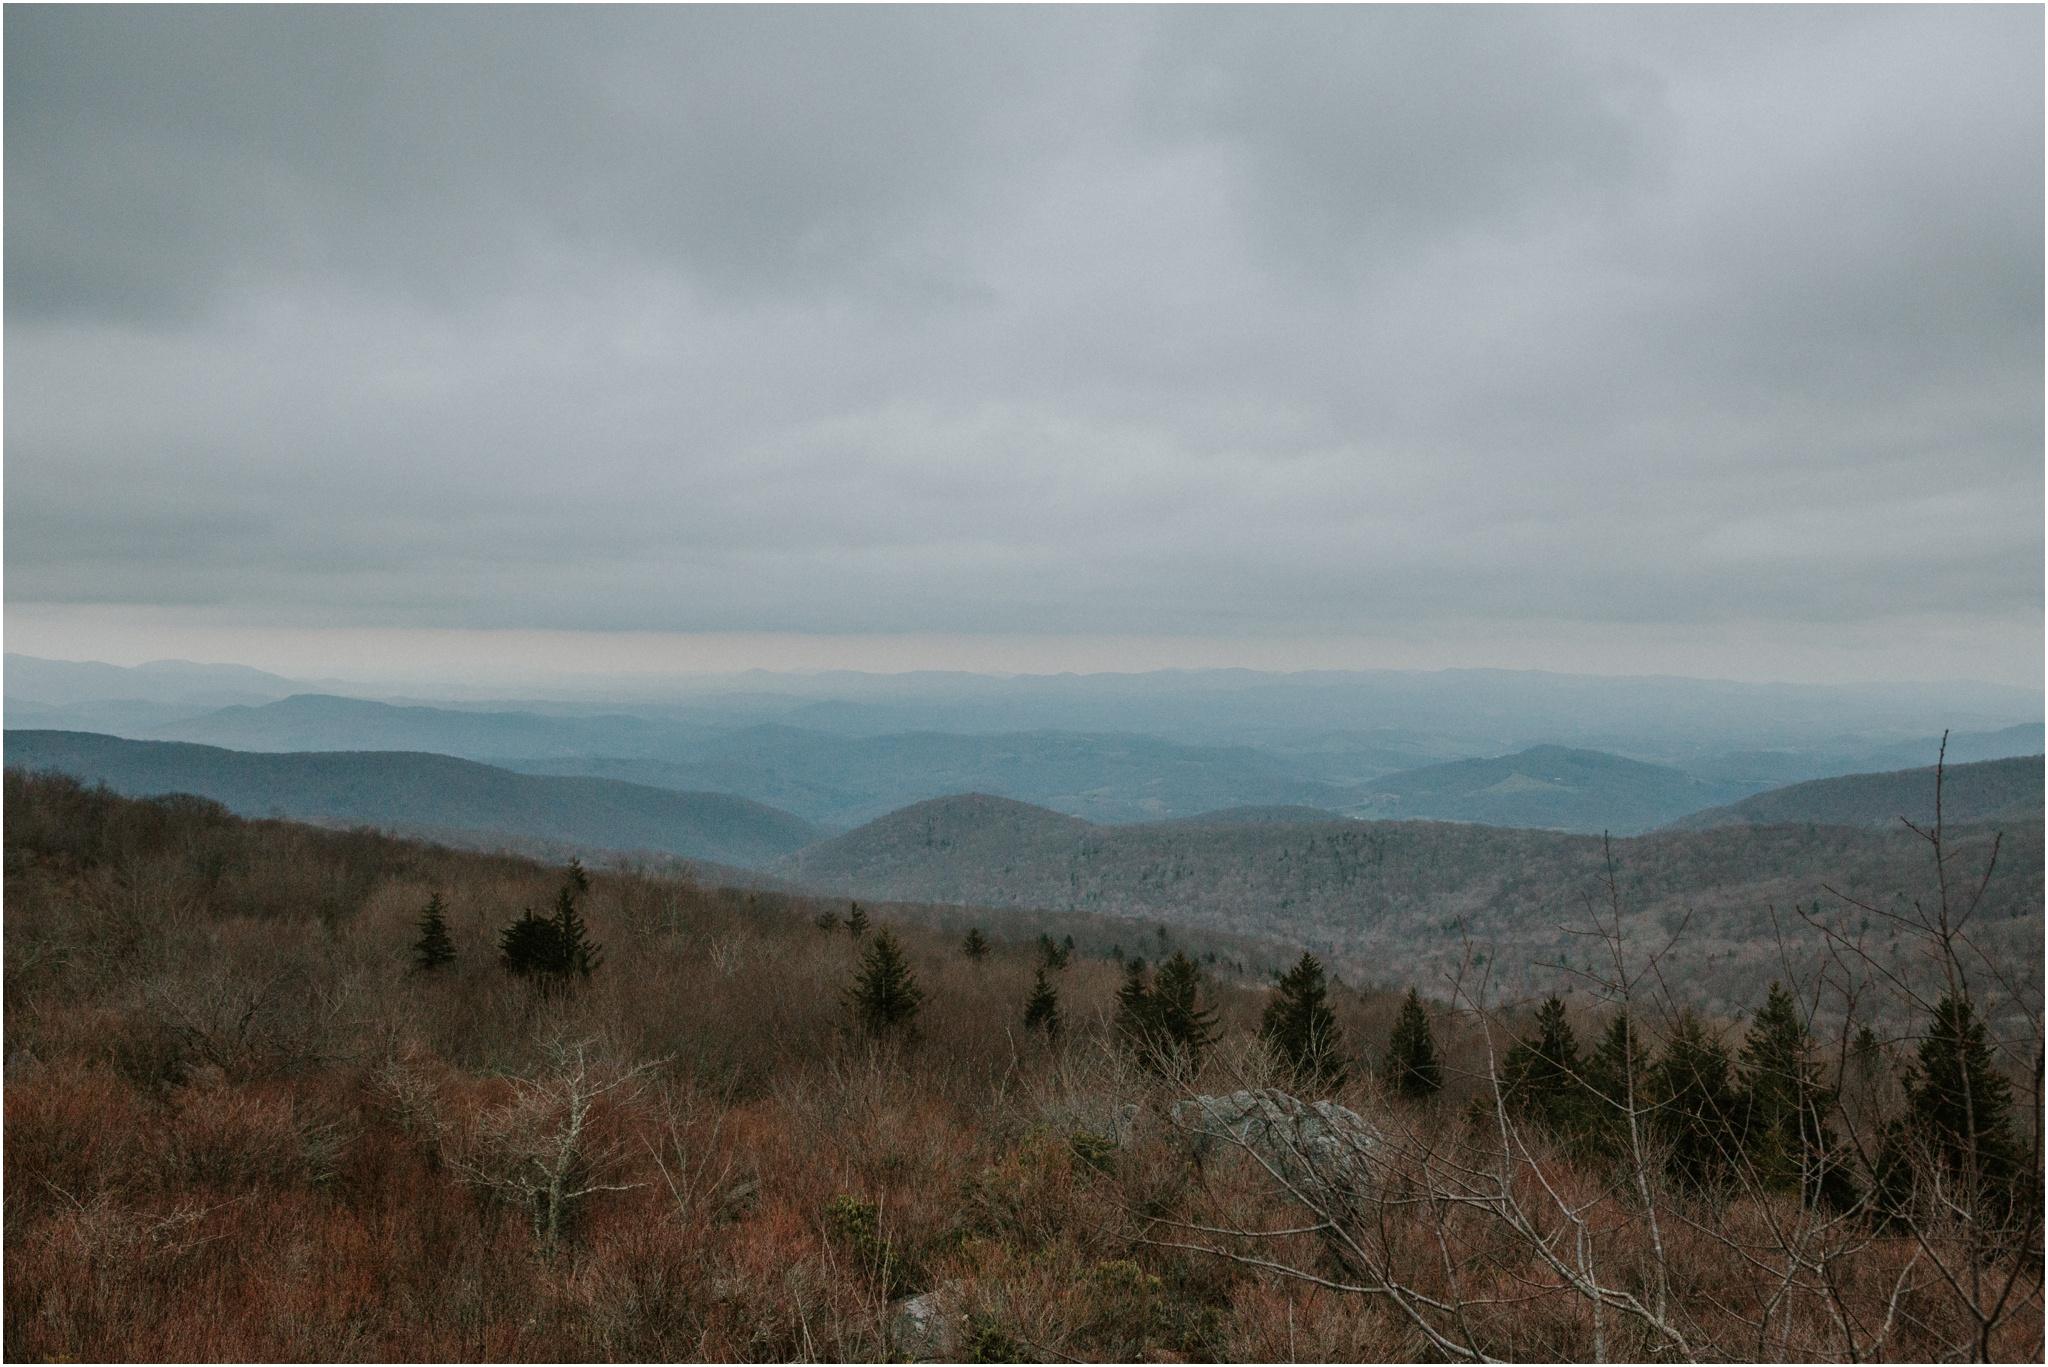 grayson-highlands-engagement-session-foggy-mountain-rustic-appalachian-virginia-katy-sergent-photography_0038.jpg